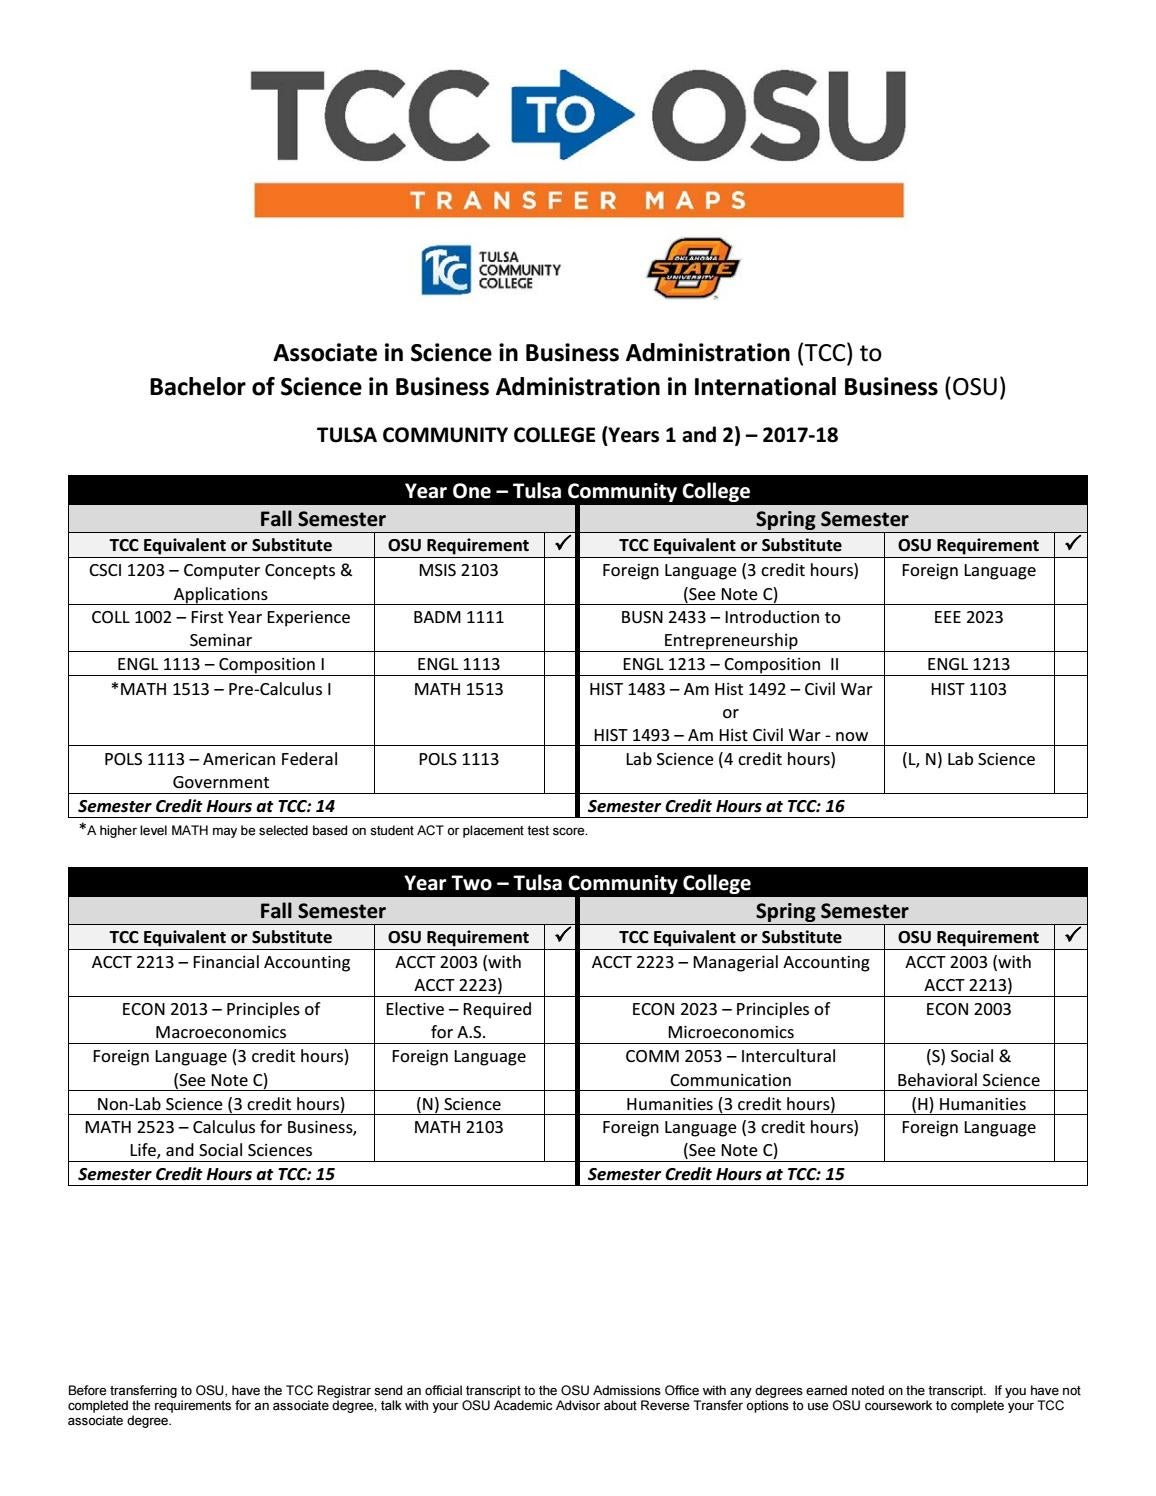 Academic Calendar Osu.Tcc To Osu International Business 2017 18 Course Transfer Map By